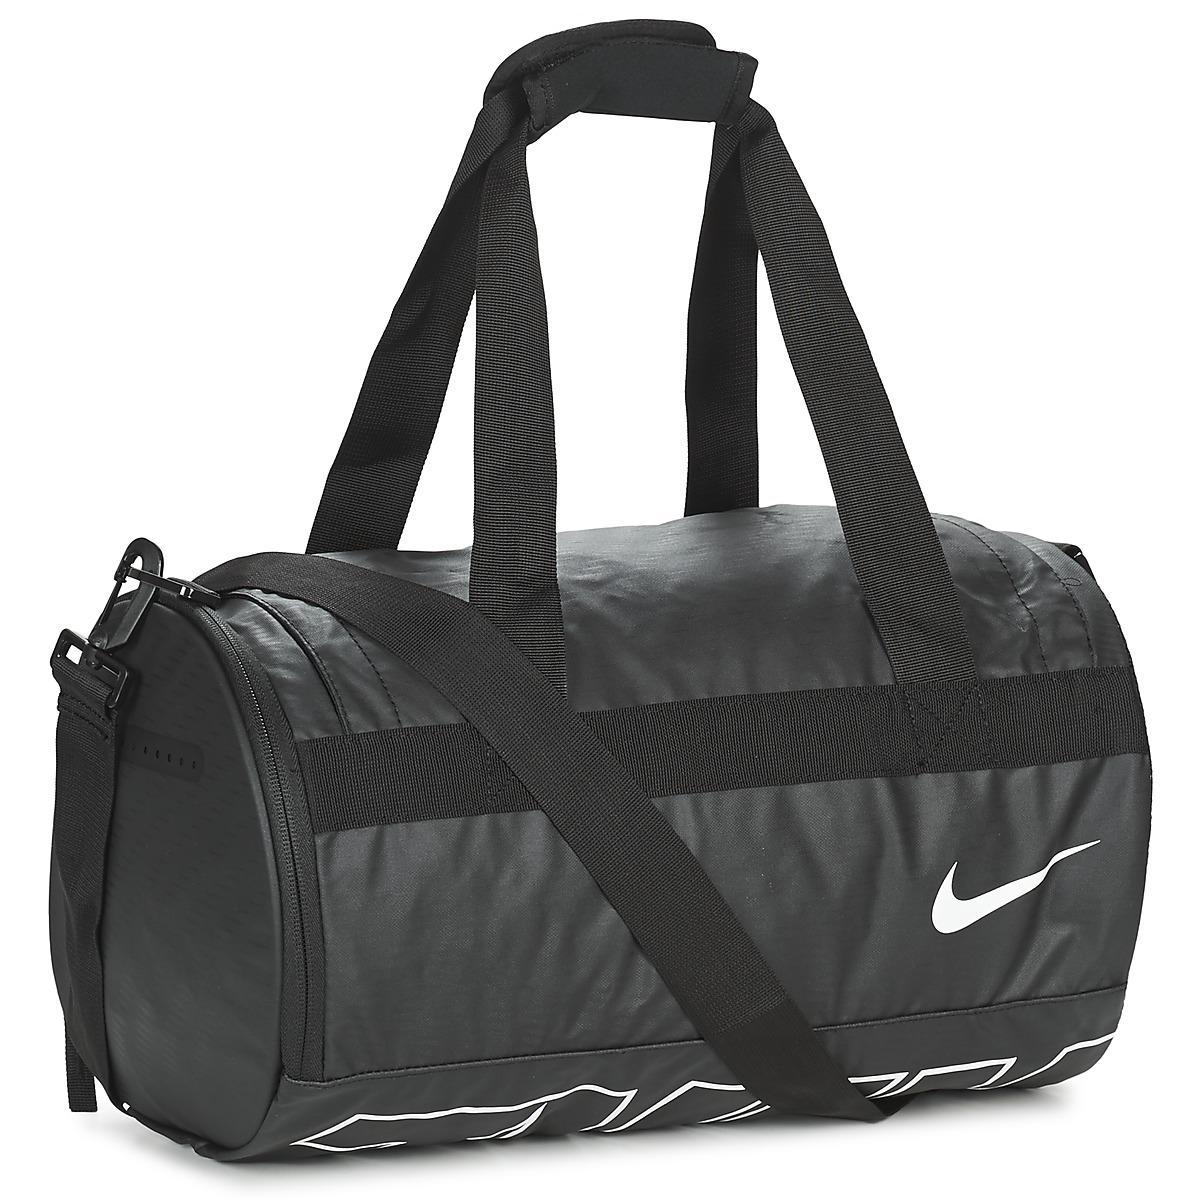 2dc5c47023 Nike Mini Duffle Men s Sports Bag In Black in Black for Men - Lyst